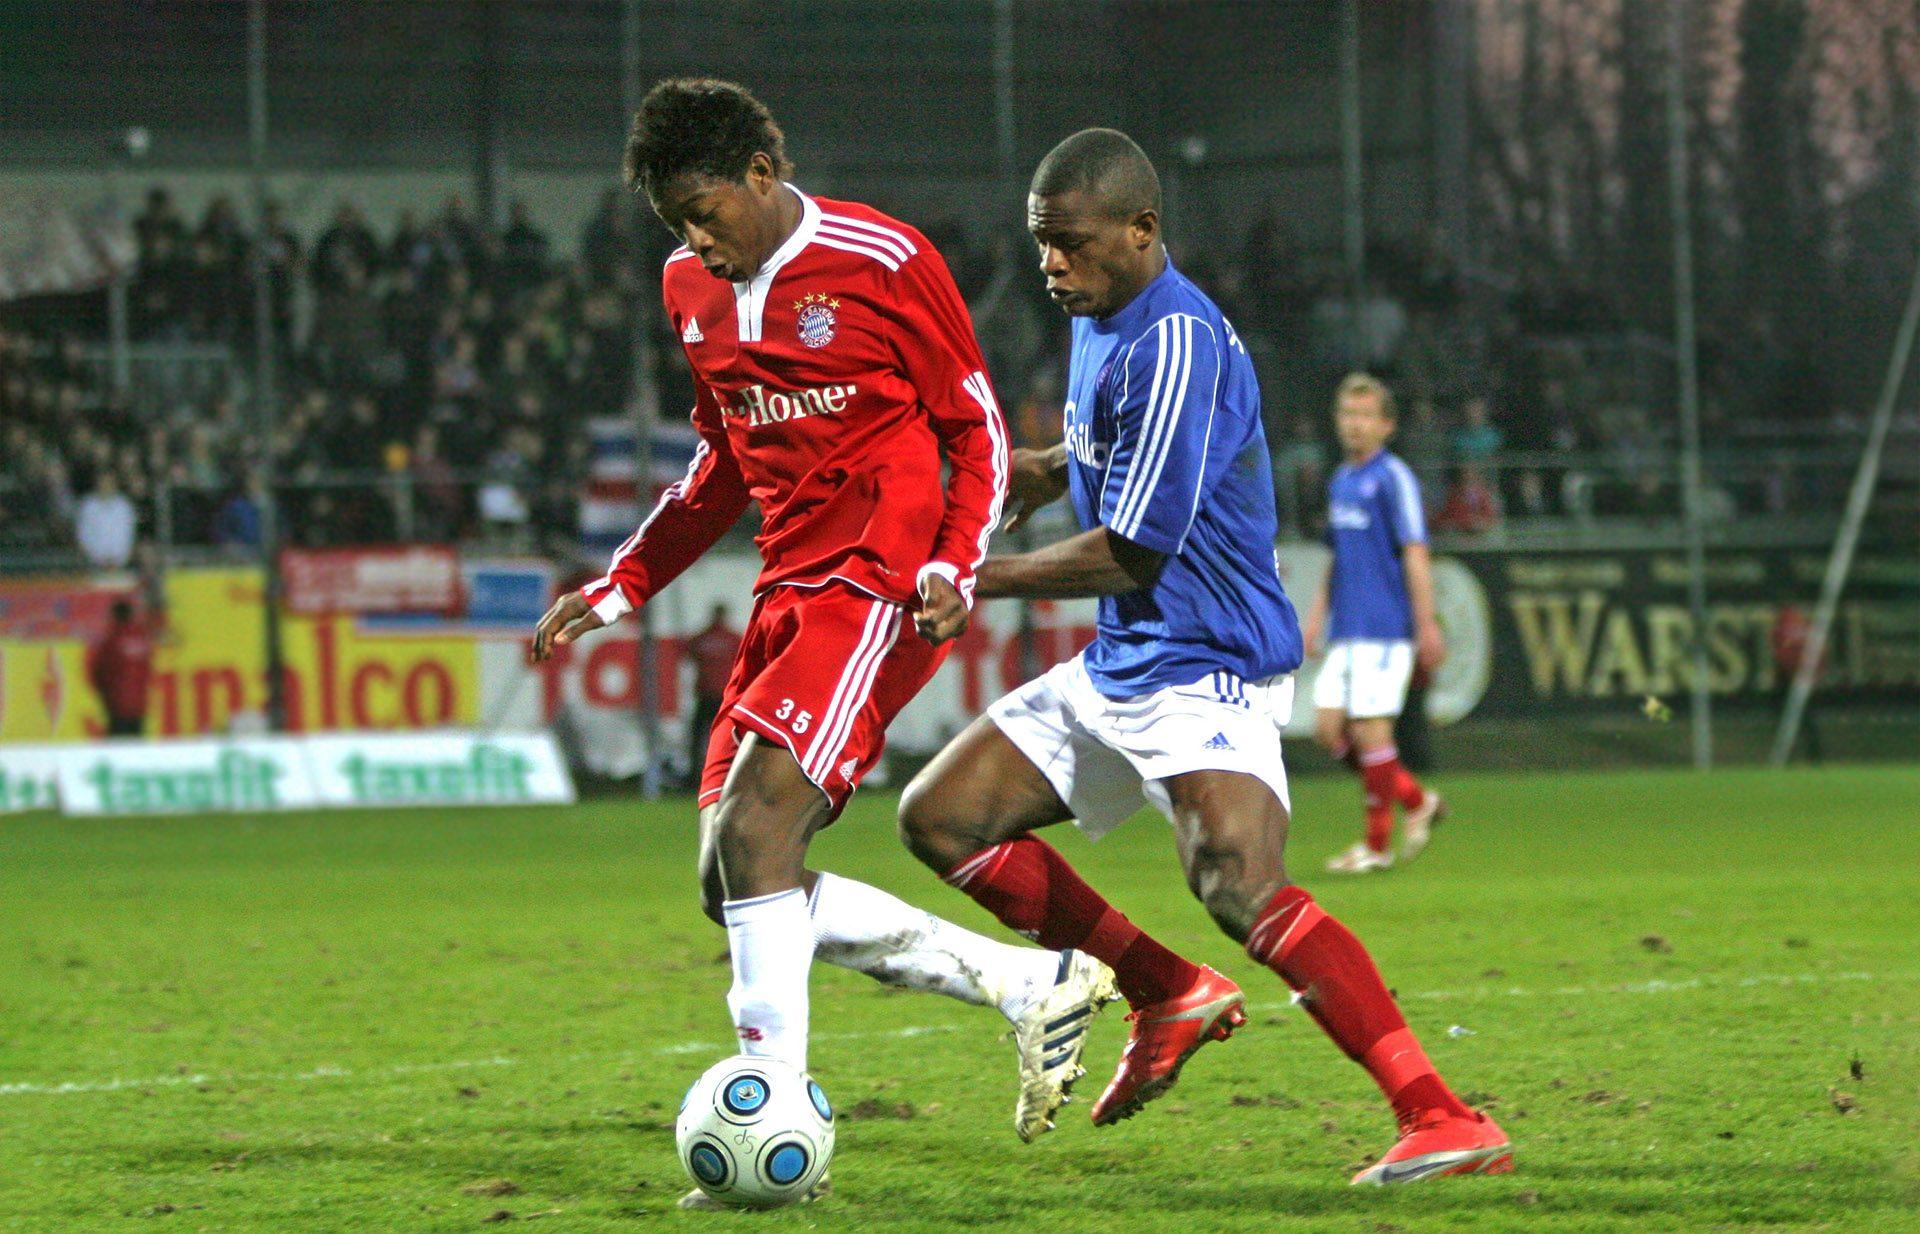 David Alaba 2010 im Drittliga Trikot von Bayern II vor dem Kieler Francky Sembolo